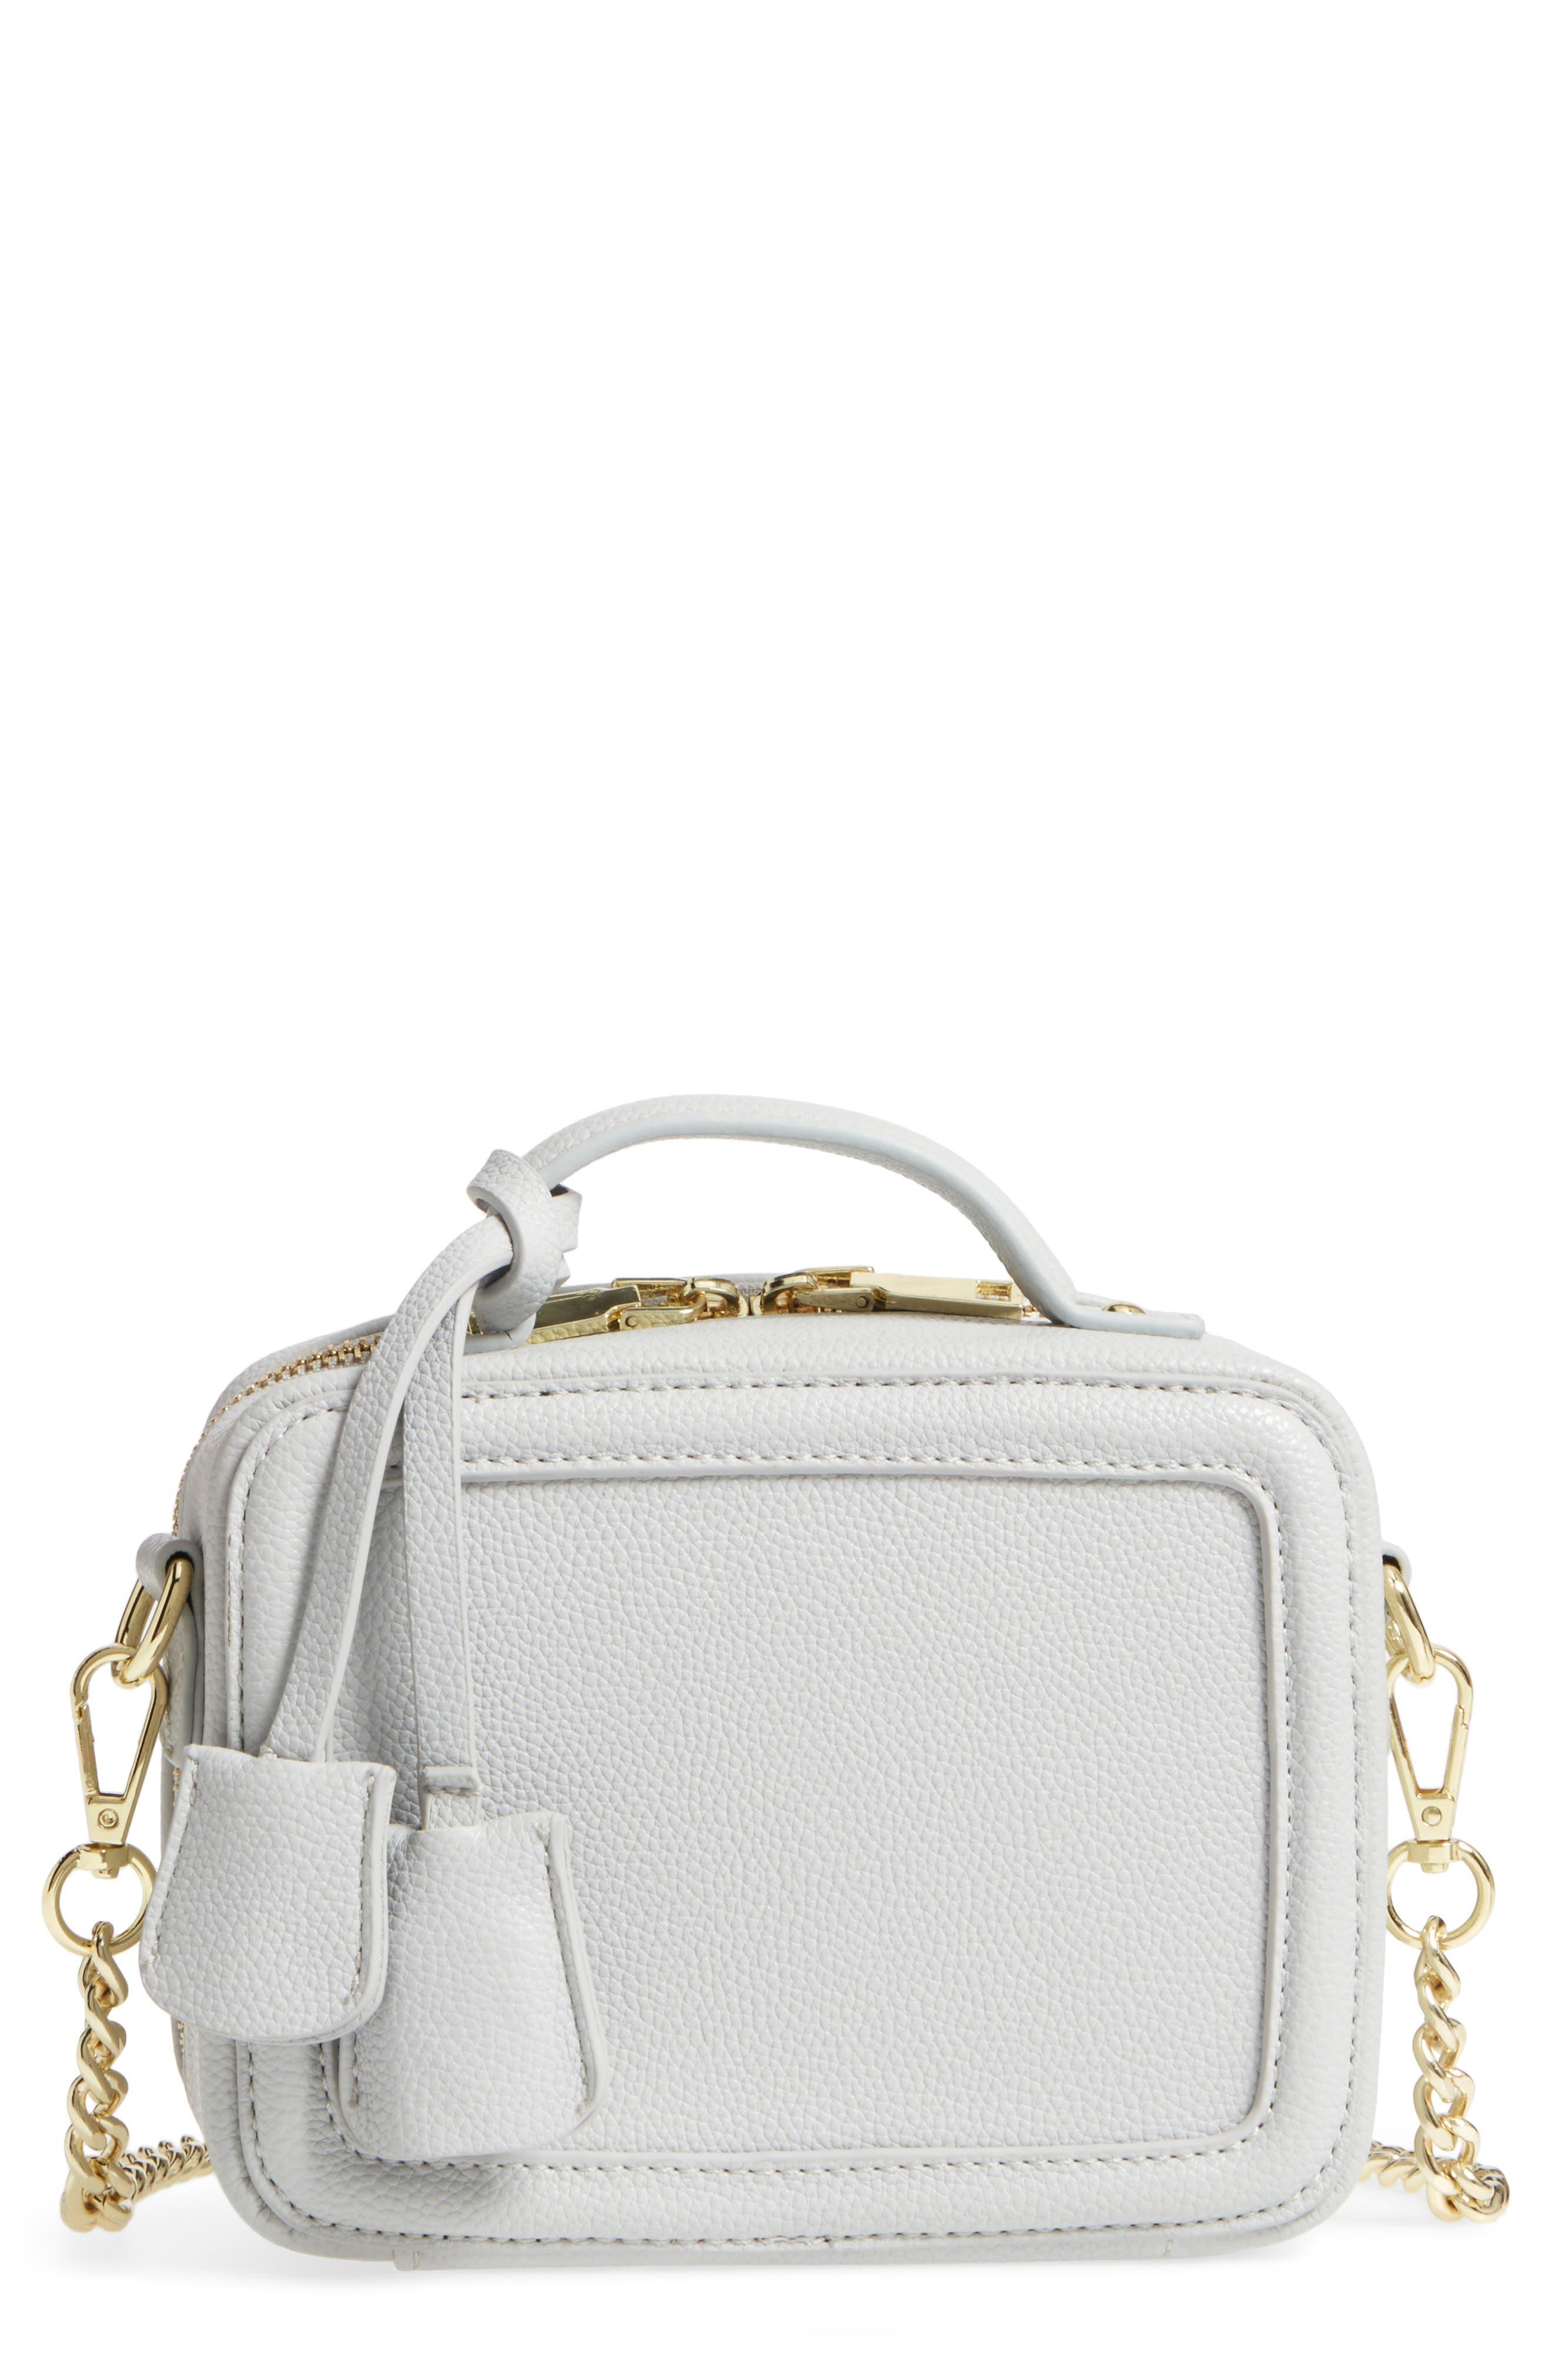 Taylor Faux Leather Crossbody Bag,                             Main thumbnail 1, color,                             Light Grey